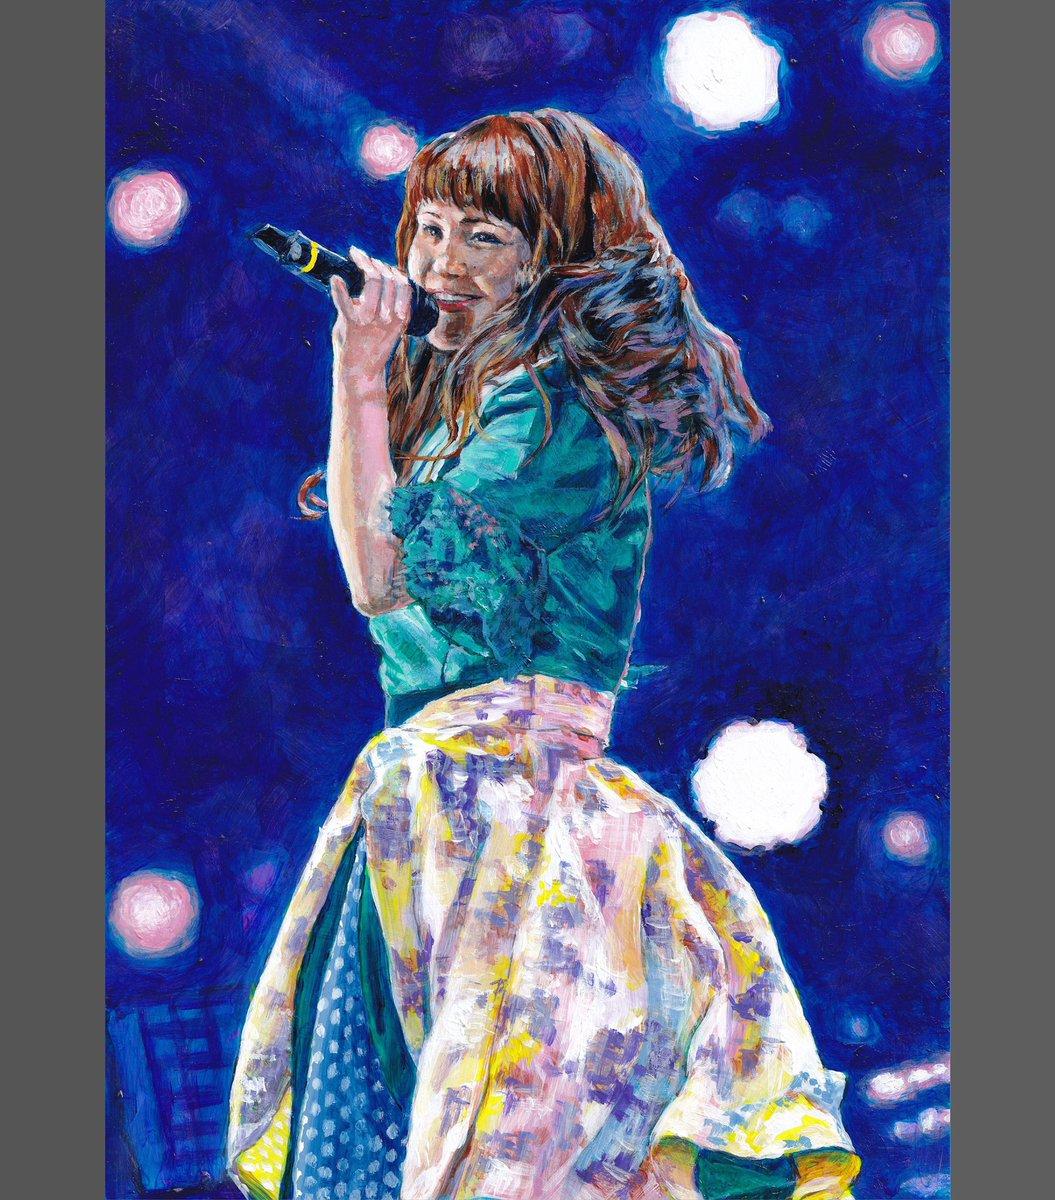 #Nao☆ 2018年7月21日 #朱鷺メッセ 画像プリントを下地にアクリル(A4版) アイドルらしいポージングを描く! 1.スキャン済み作品 2.元画像にホワイト下塗り 3.輪郭線描きおこし 4.ブルーの影に黄・ピンクを置く 複雑で大変( ꒪Д꒪)! #negicco #acrylicpainting #art #japaneseidol #niigatapic.twitter.com/lfIk8qgYwG